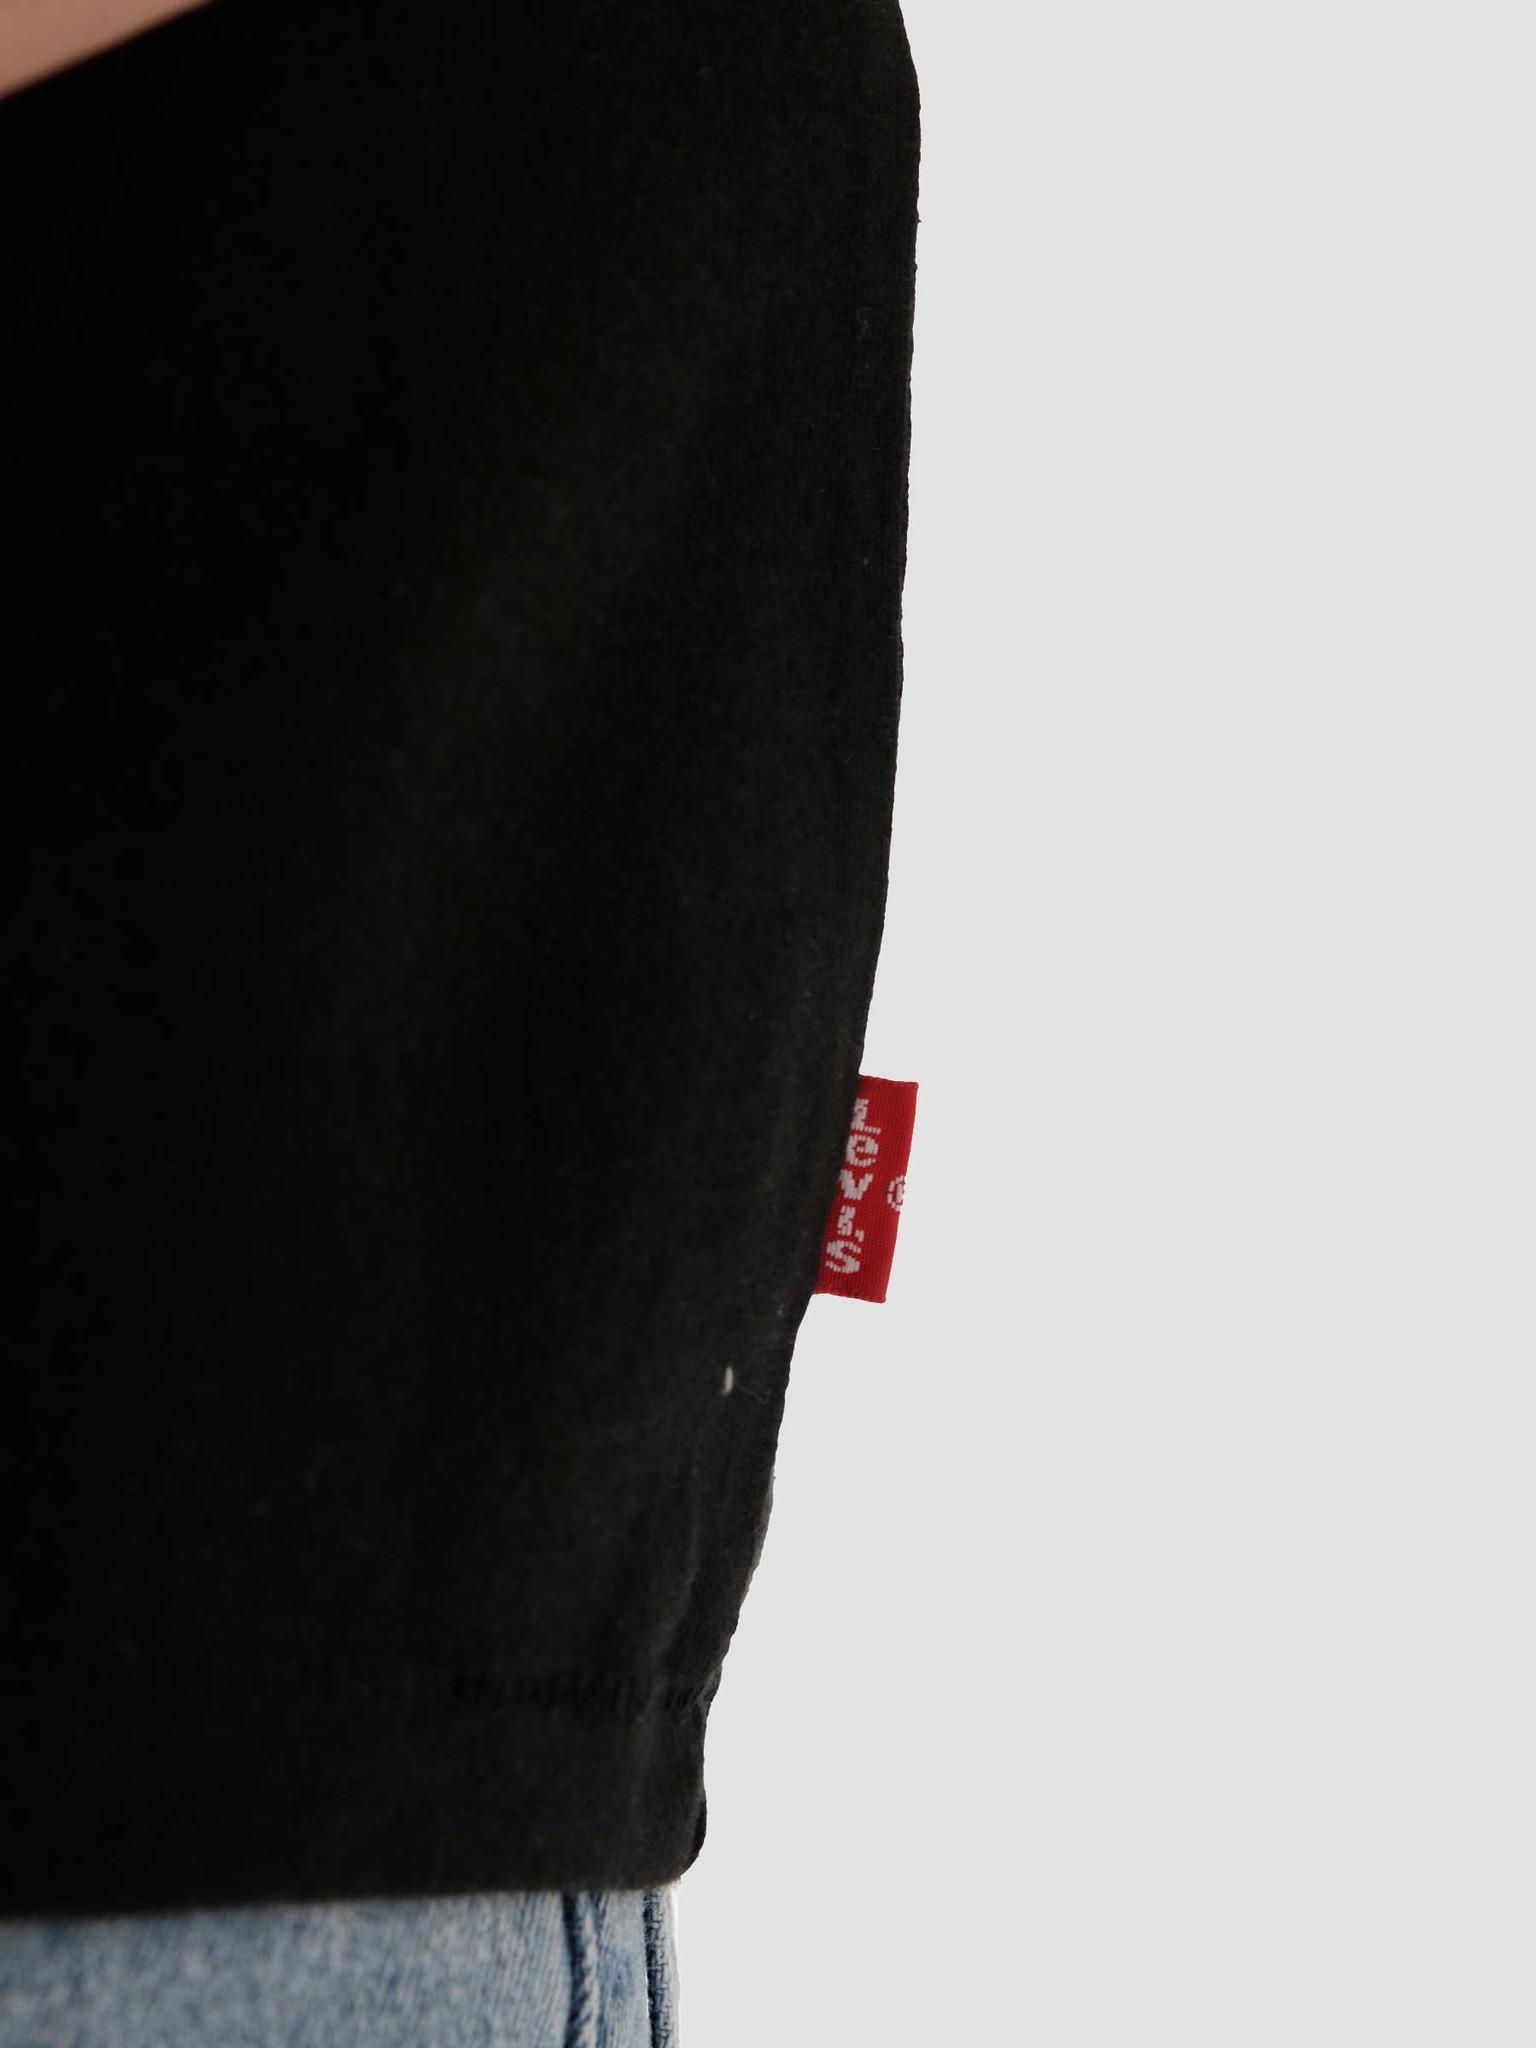 Levis Levis Red Tab Vintage T-Shirt Mineral Bl Blacks A0637-0001